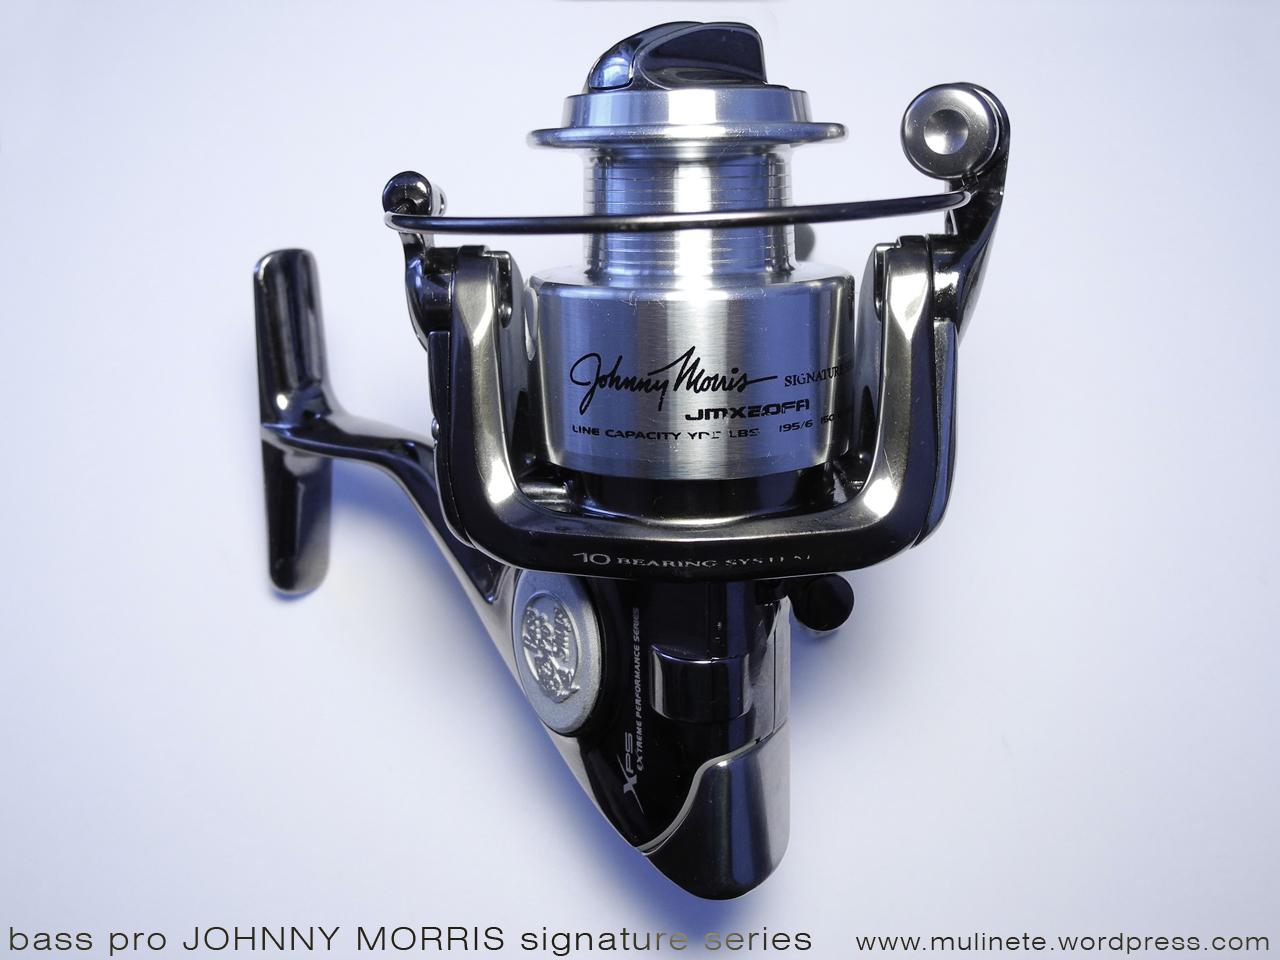 bass_pro_johnny_morris_signature_01.jpg